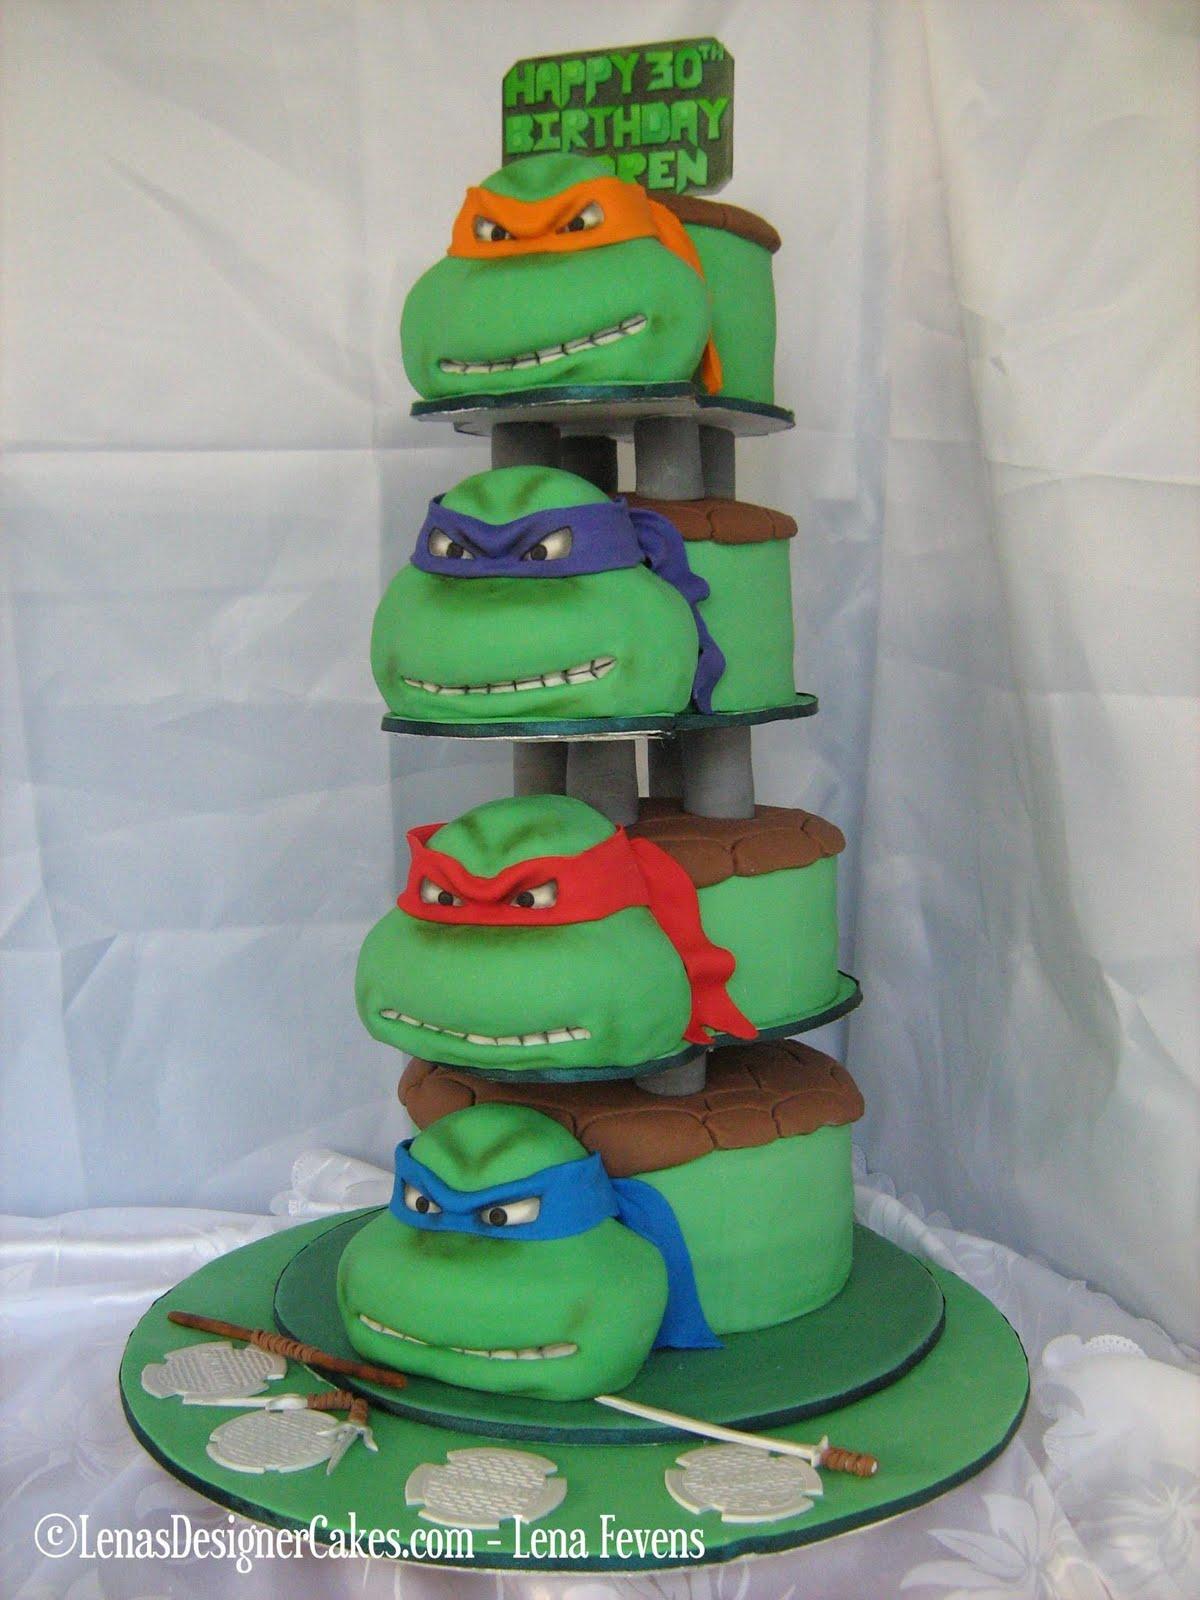 Cake Designer Head Shot